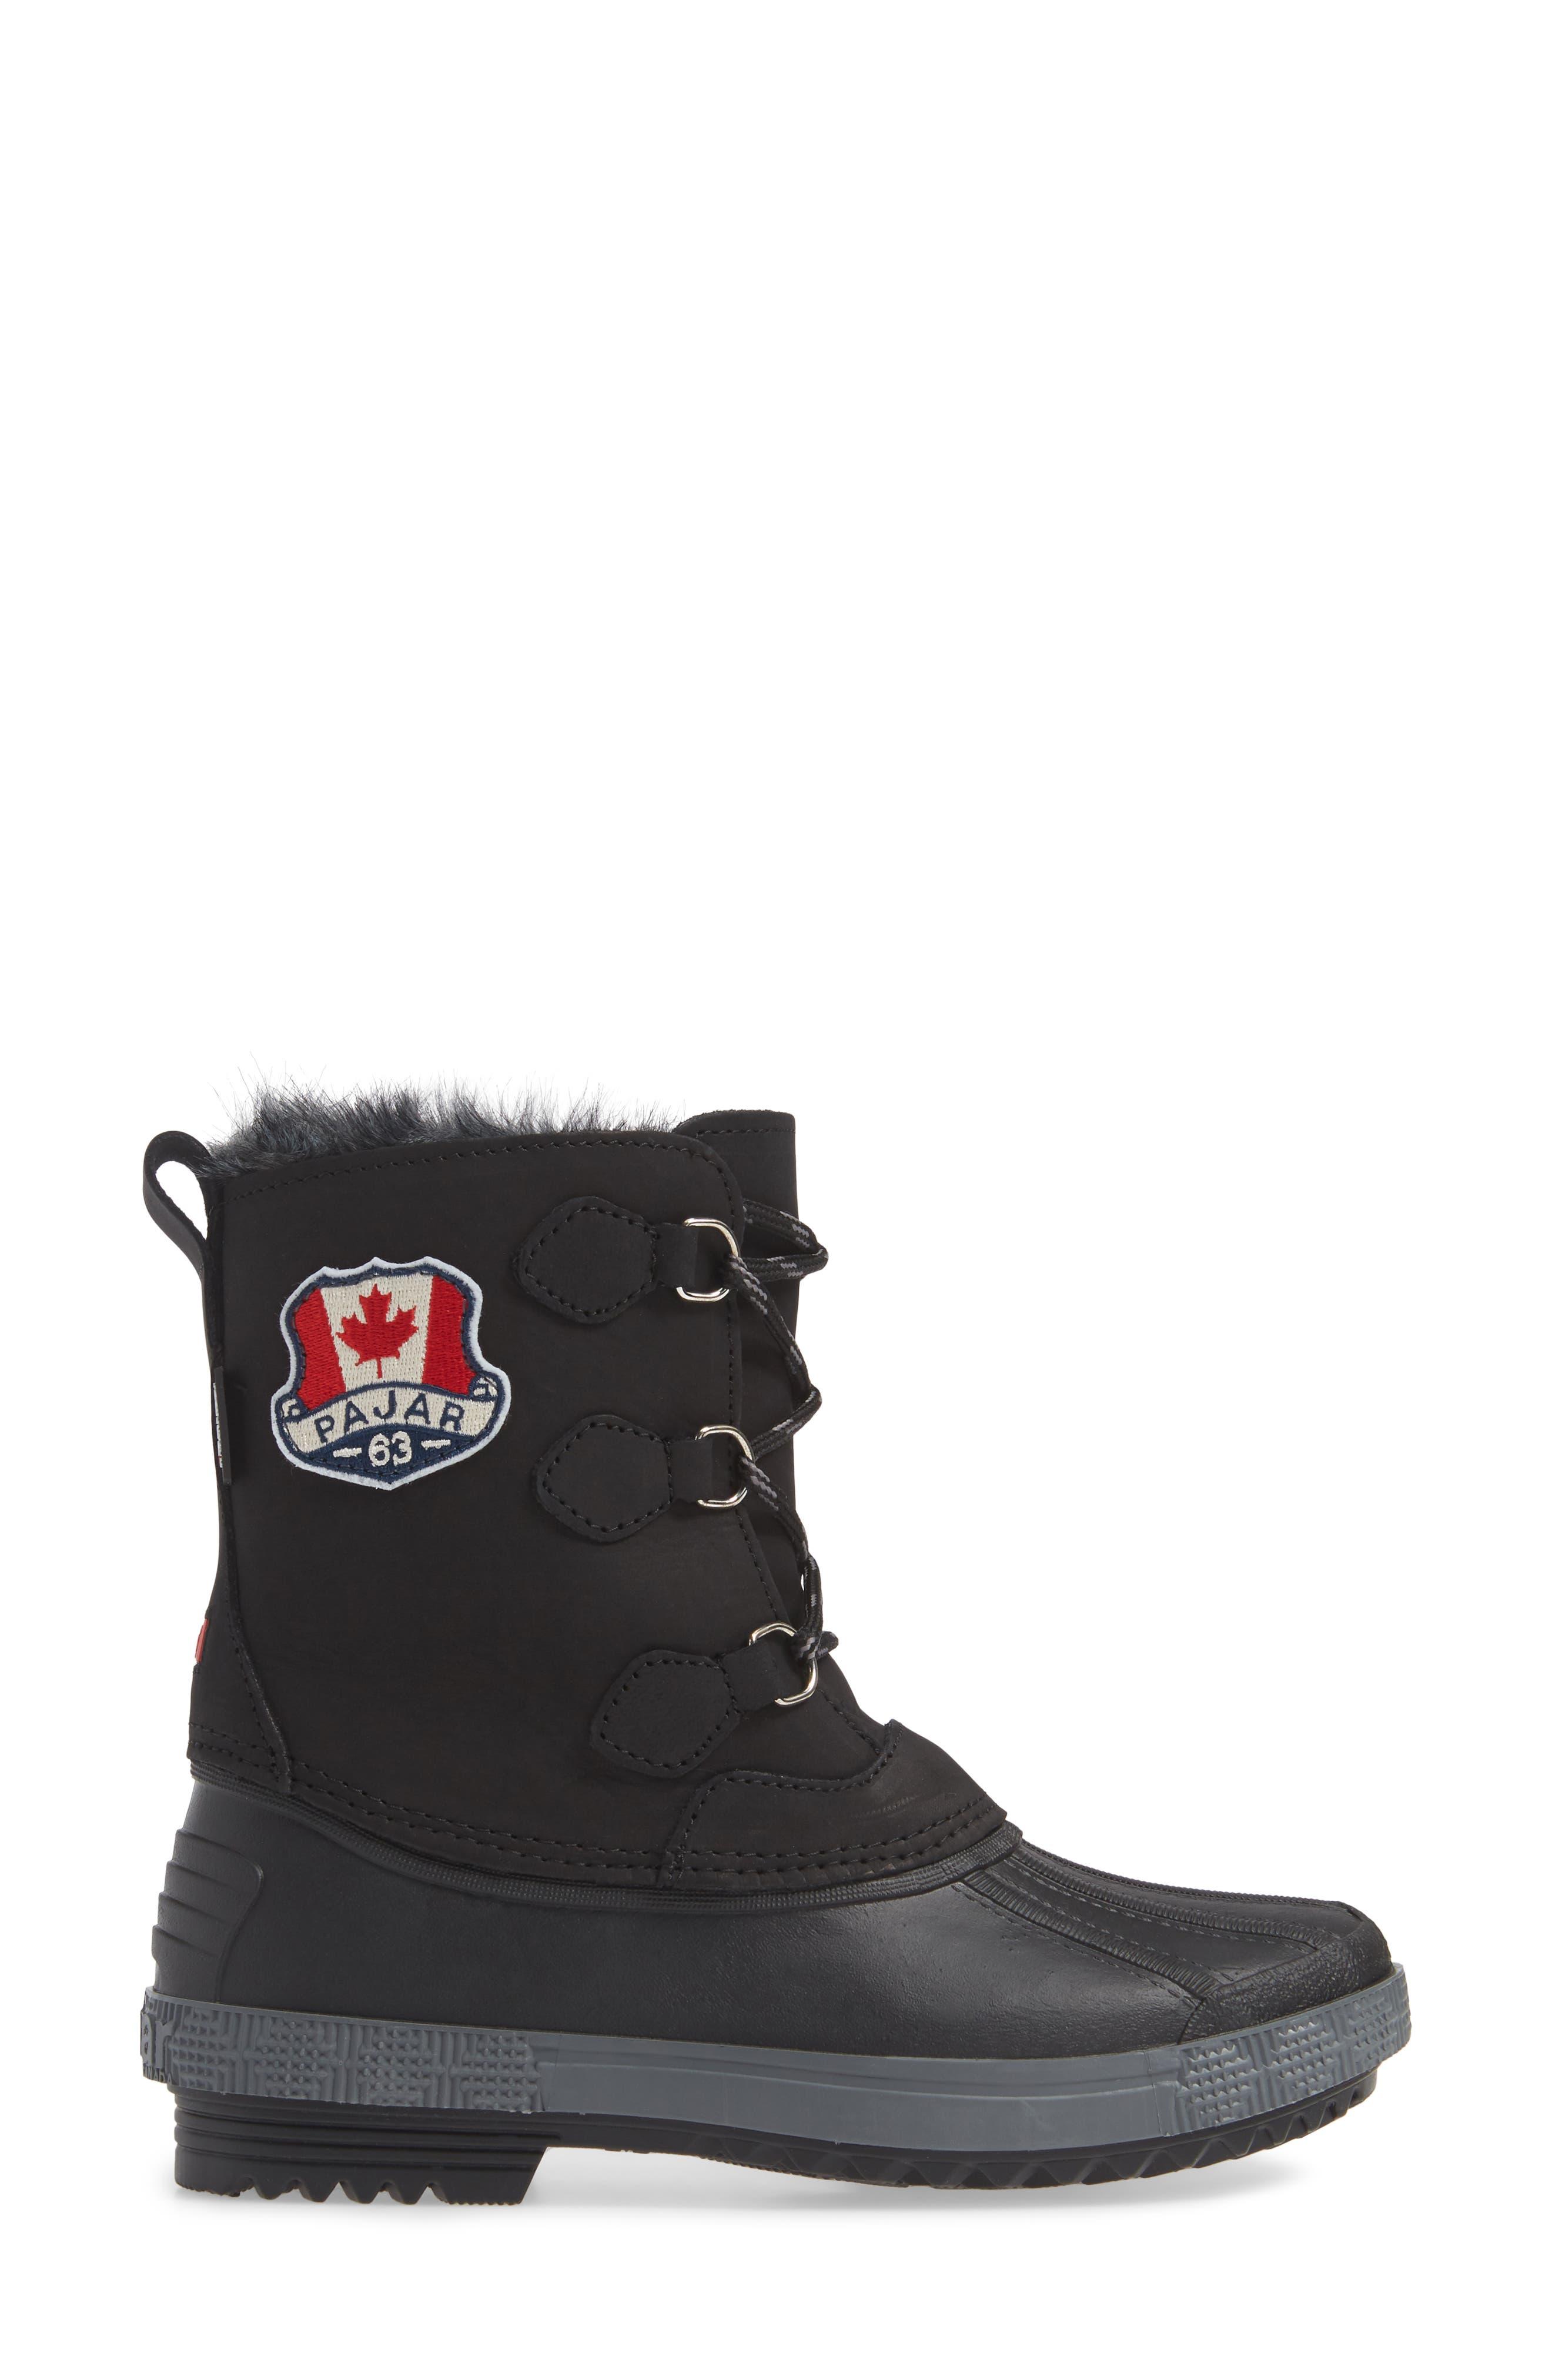 Cali Waterproof Insulated Boot,                             Alternate thumbnail 3, color,                             BROWN/ BLACK